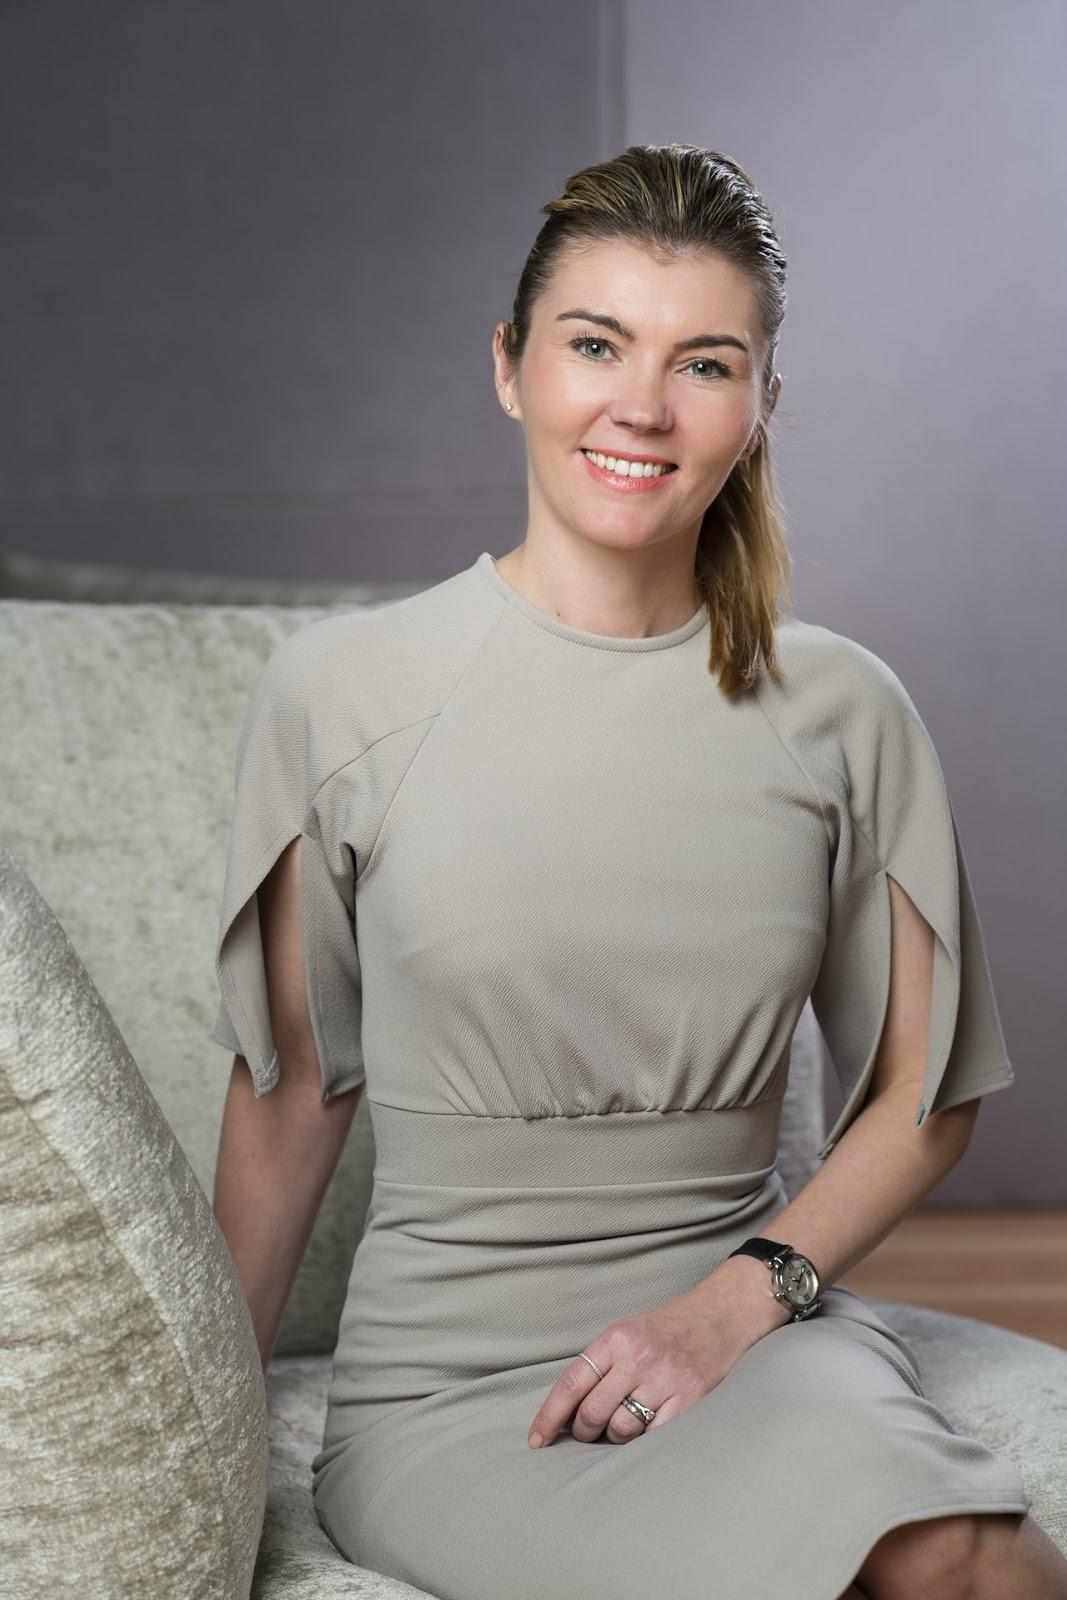 Zakladatelka módního e-shopu Tamsin Lenka O'Neill